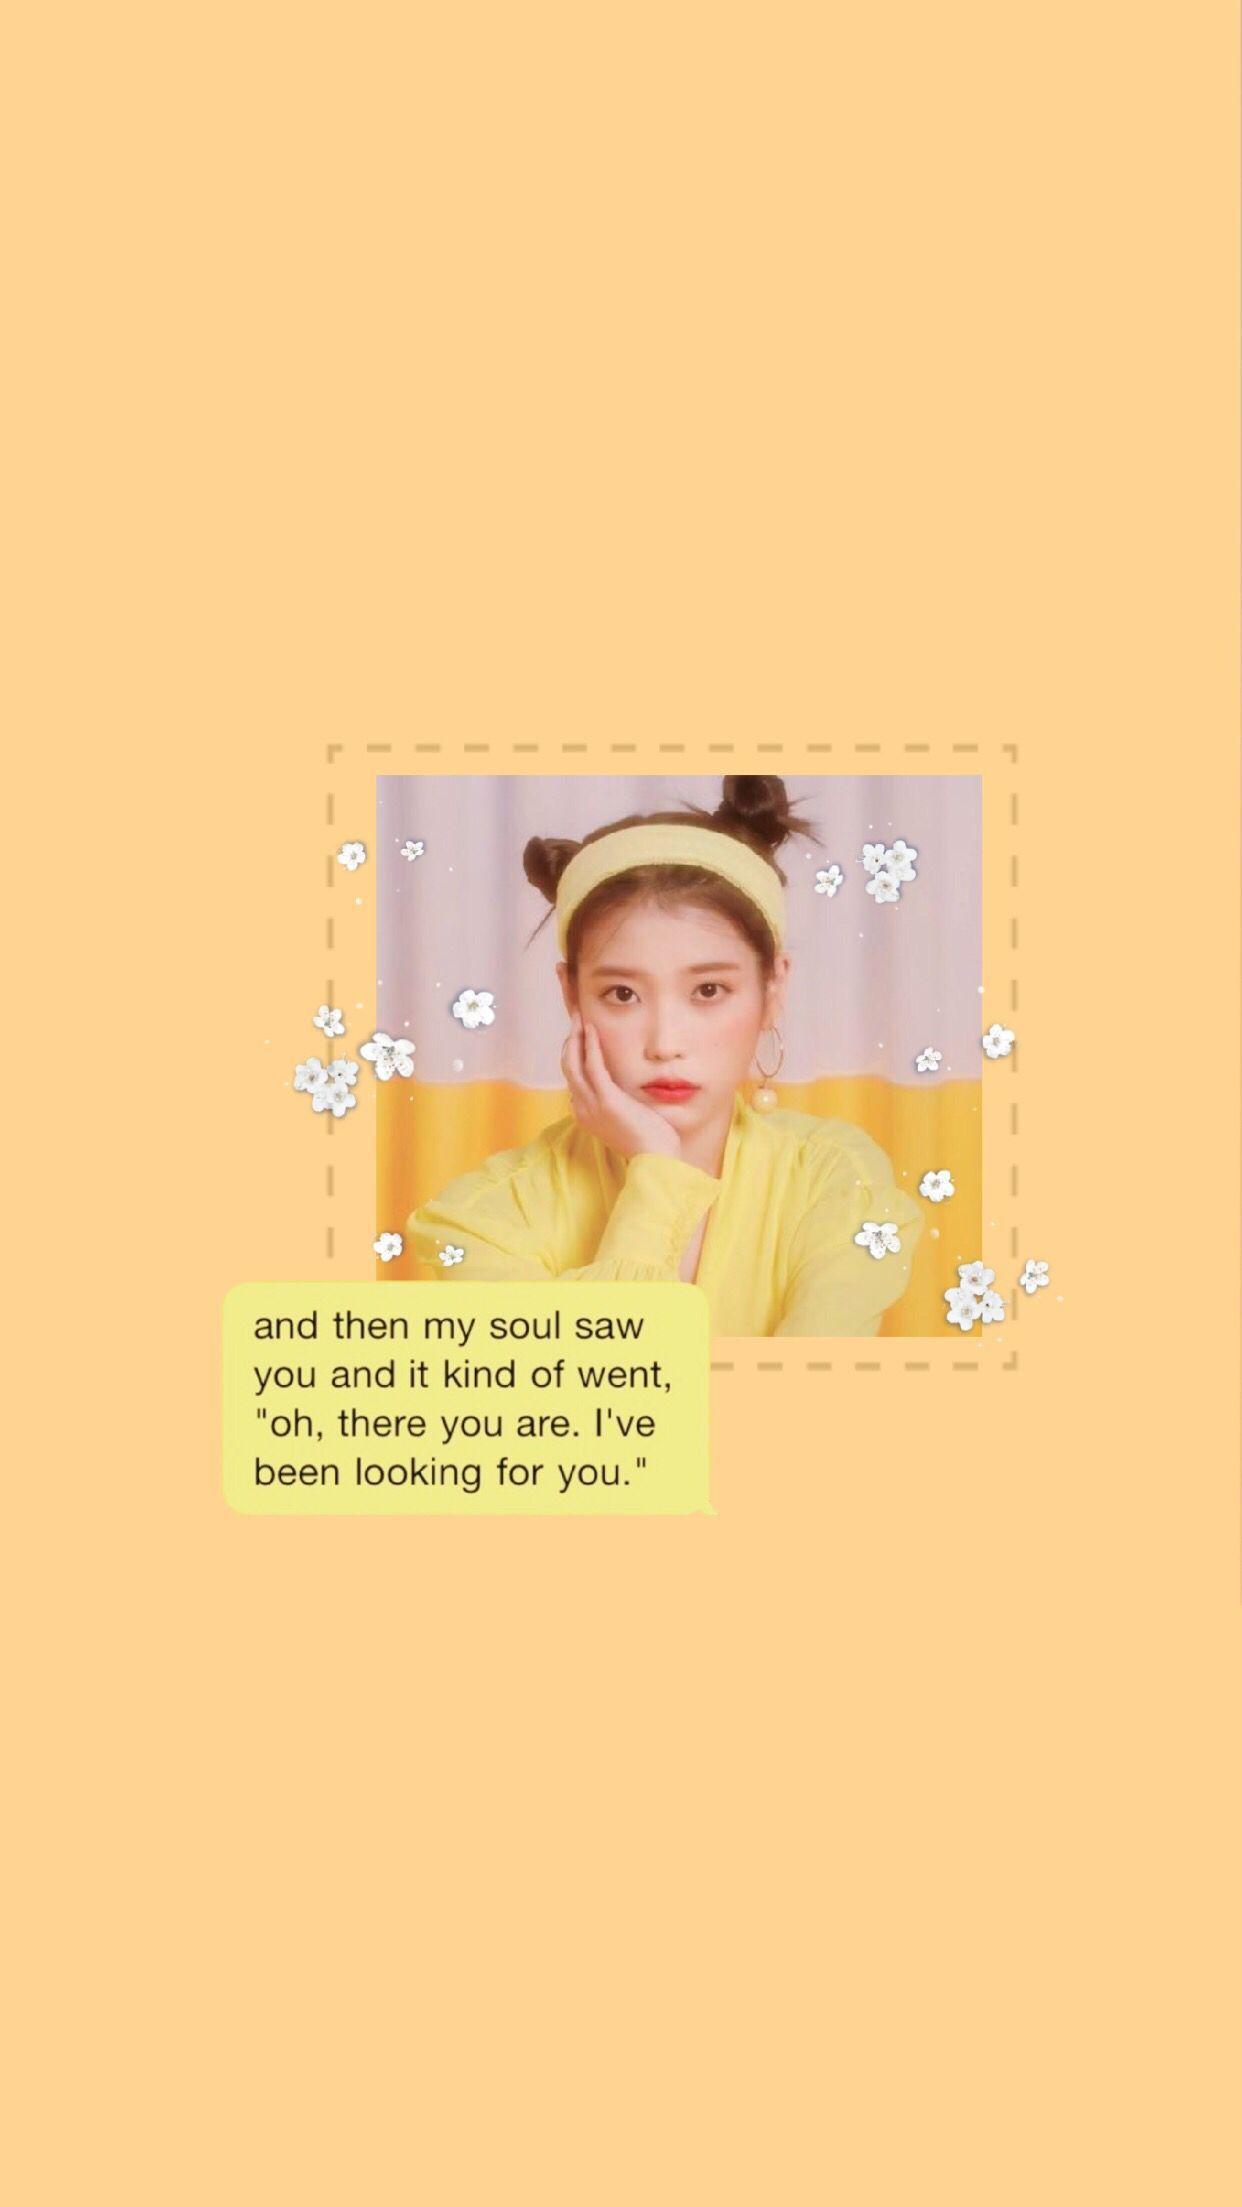 Kpop Aesthetic Wallpapers   Top Kpop Aesthetic Backgrounds 1242x2207